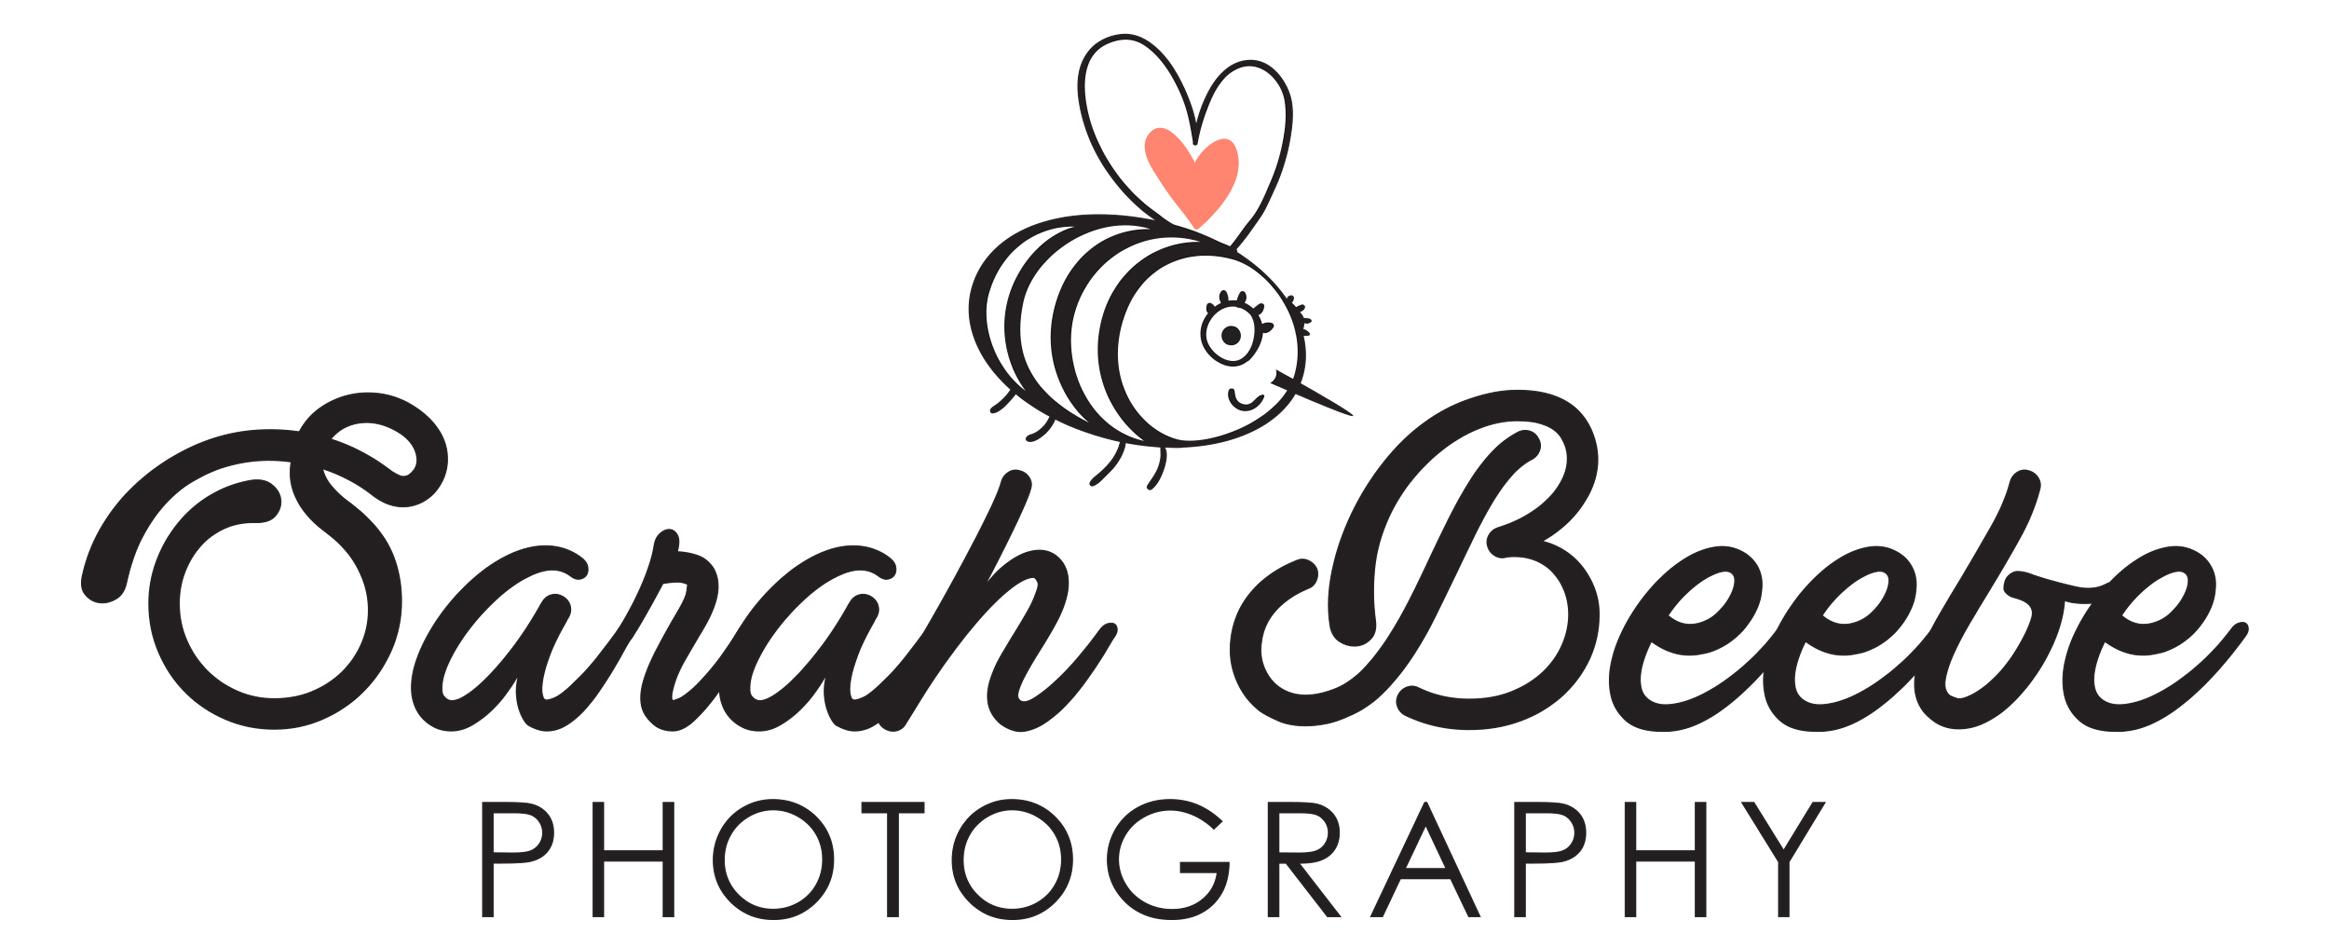 Sarah Beebe Logo.jpg